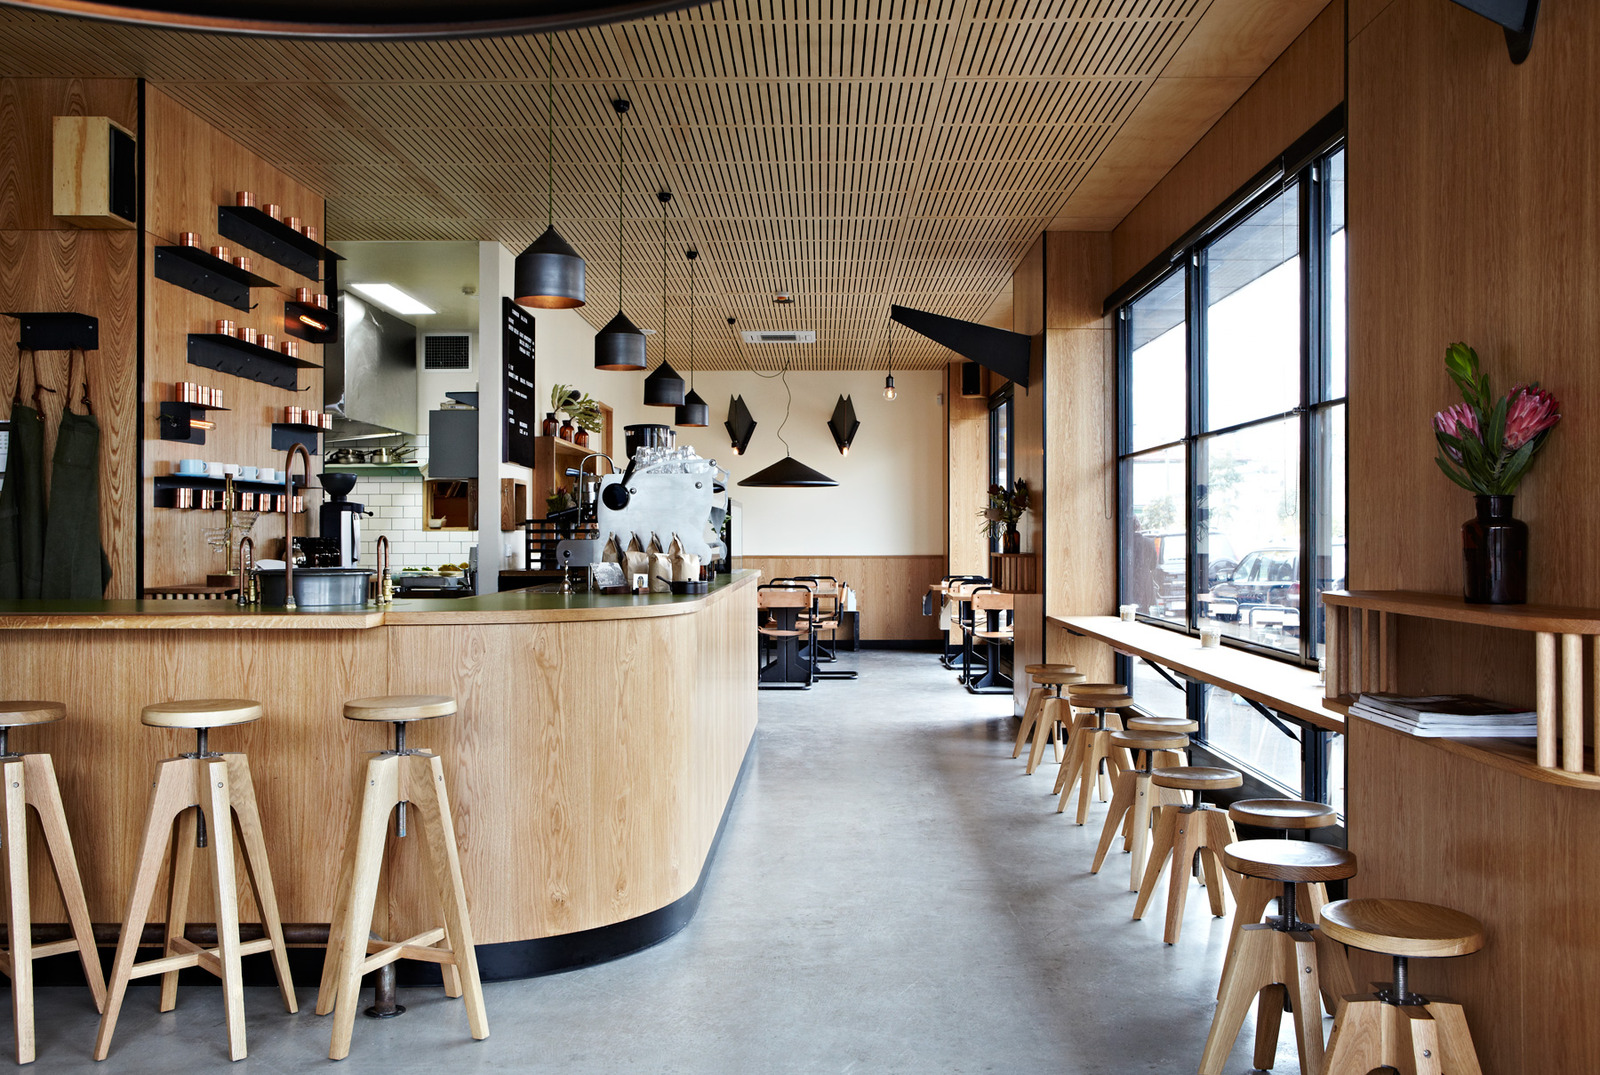 Common Galaxia Coffee bar in Australia - Jelanie 4